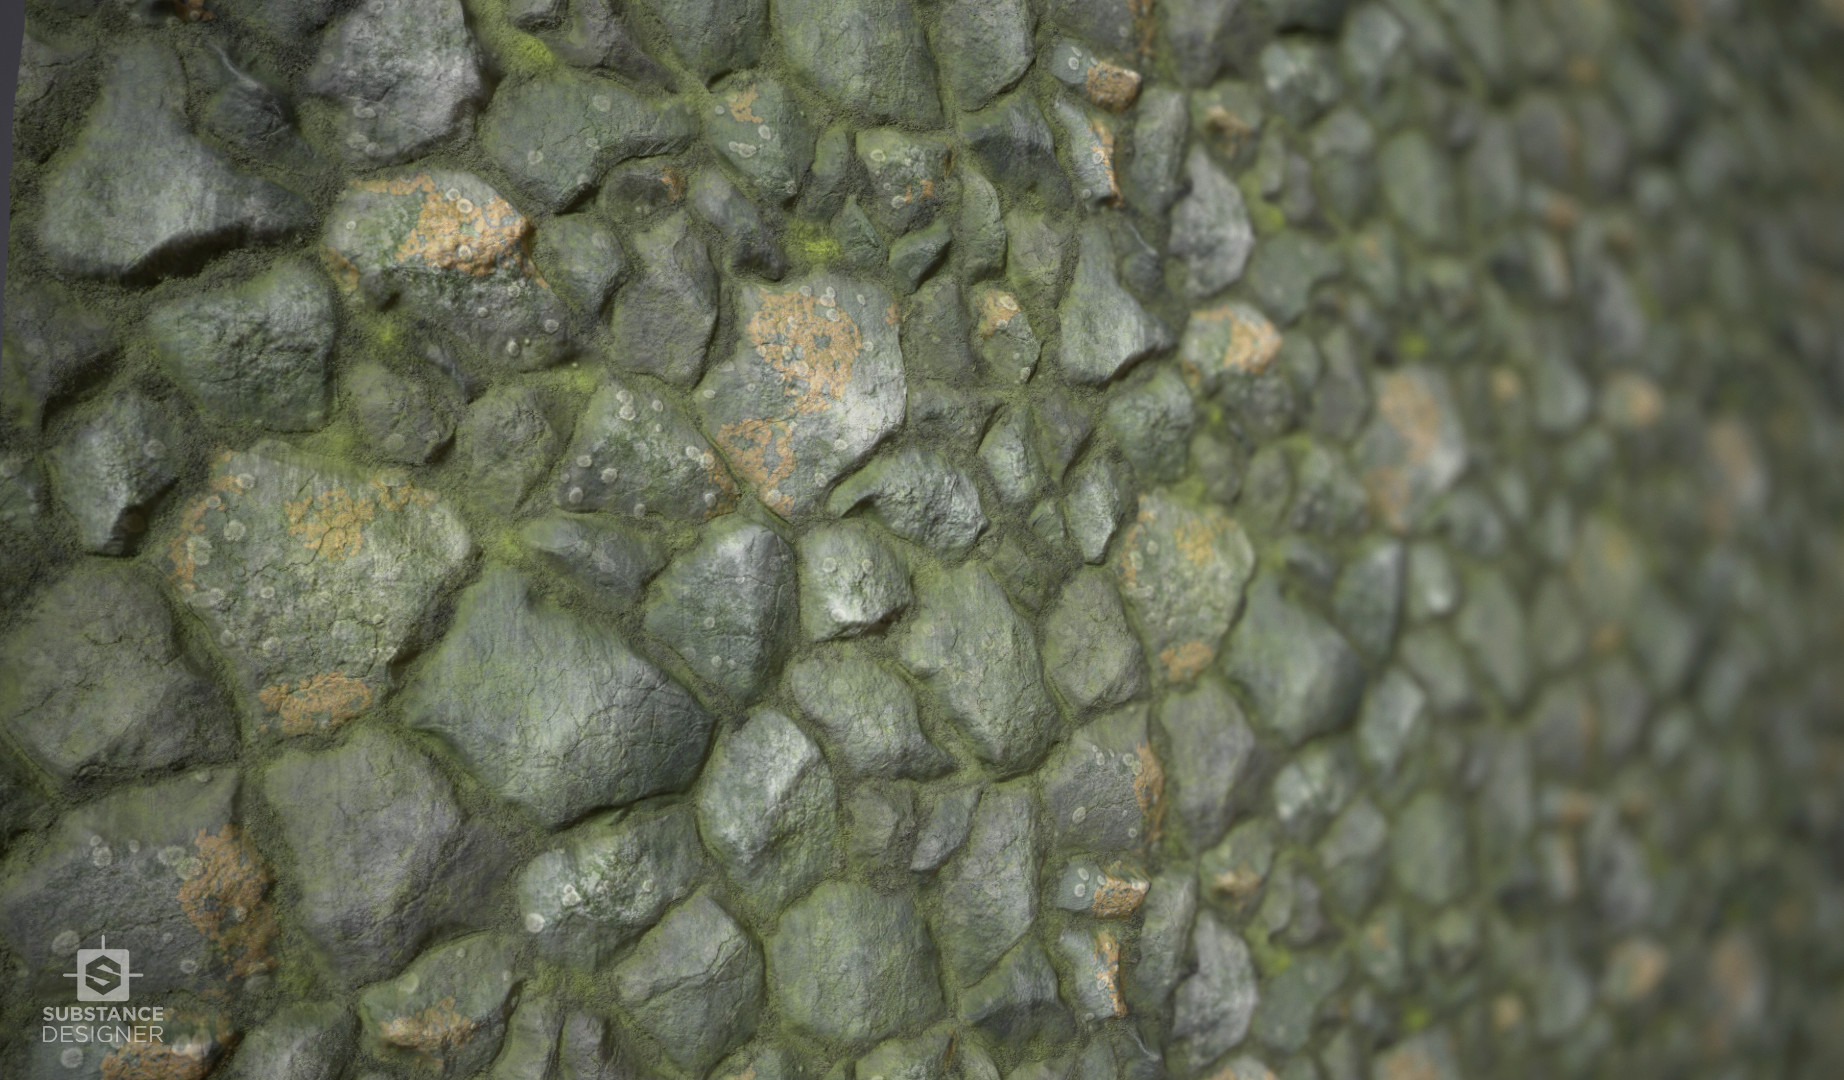 Alina godfrey bridge rocks